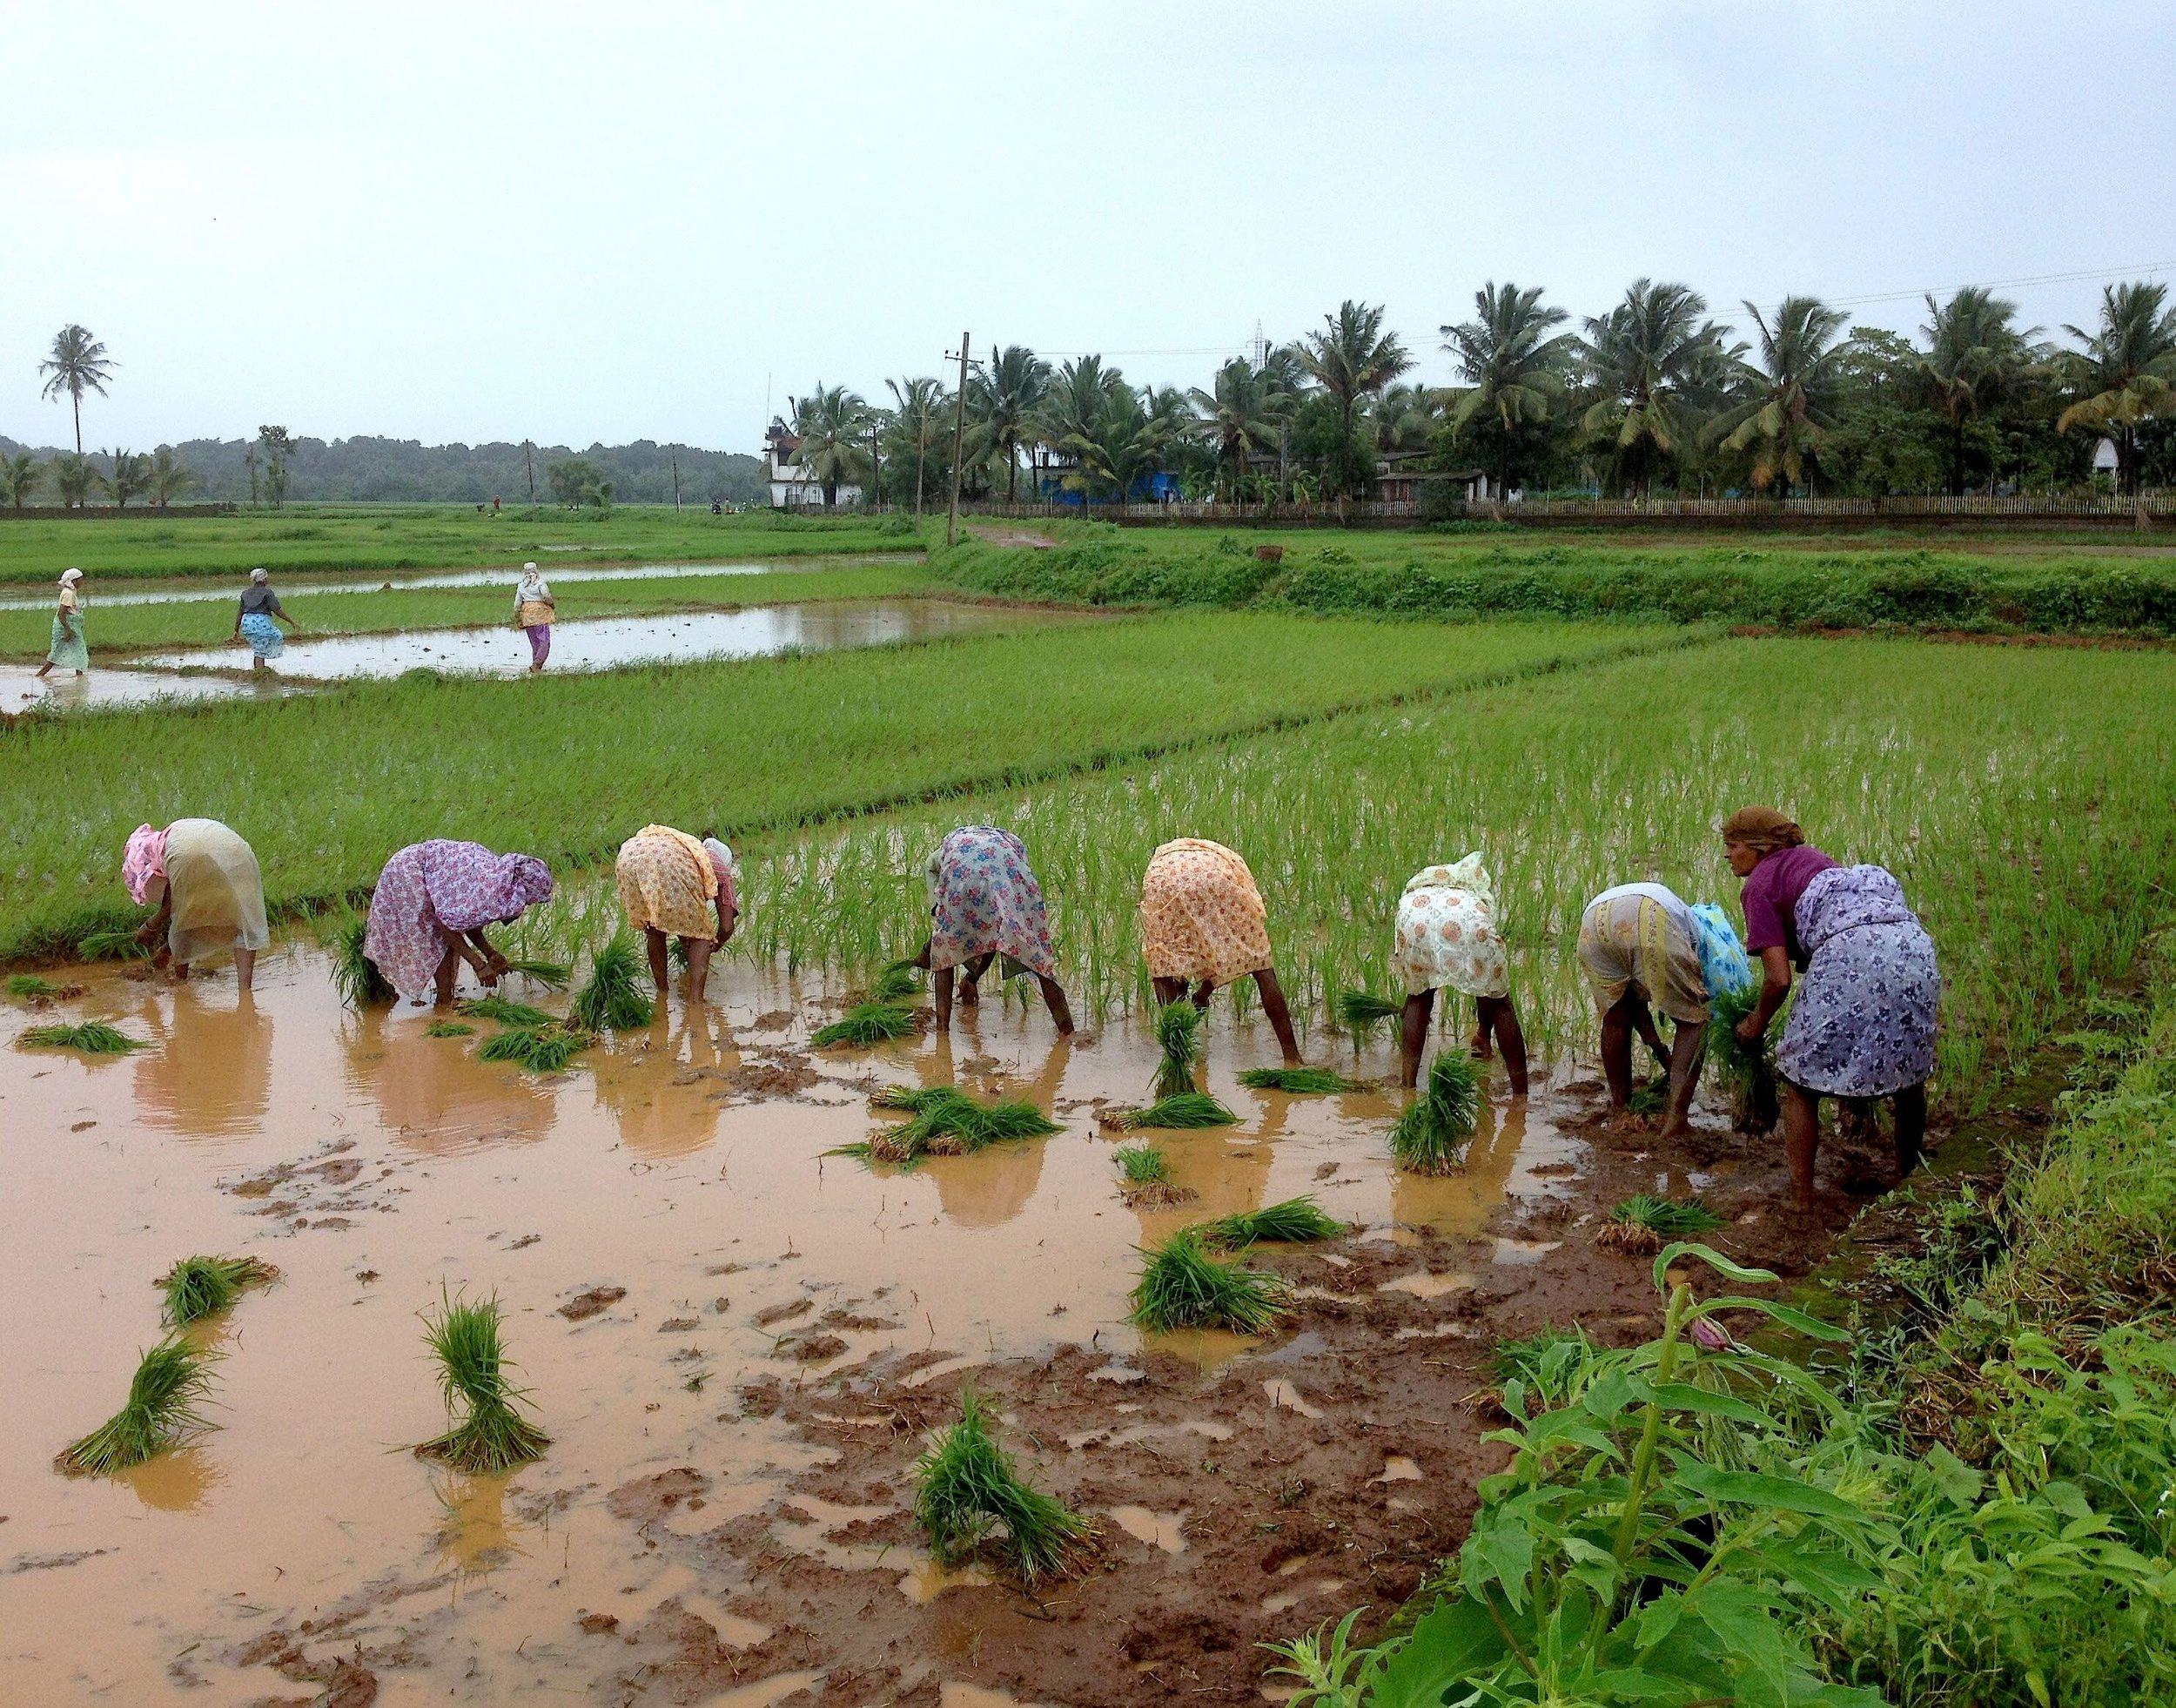 Rice fields of Goa. Picture courtesy of Saxtticho Koddo.